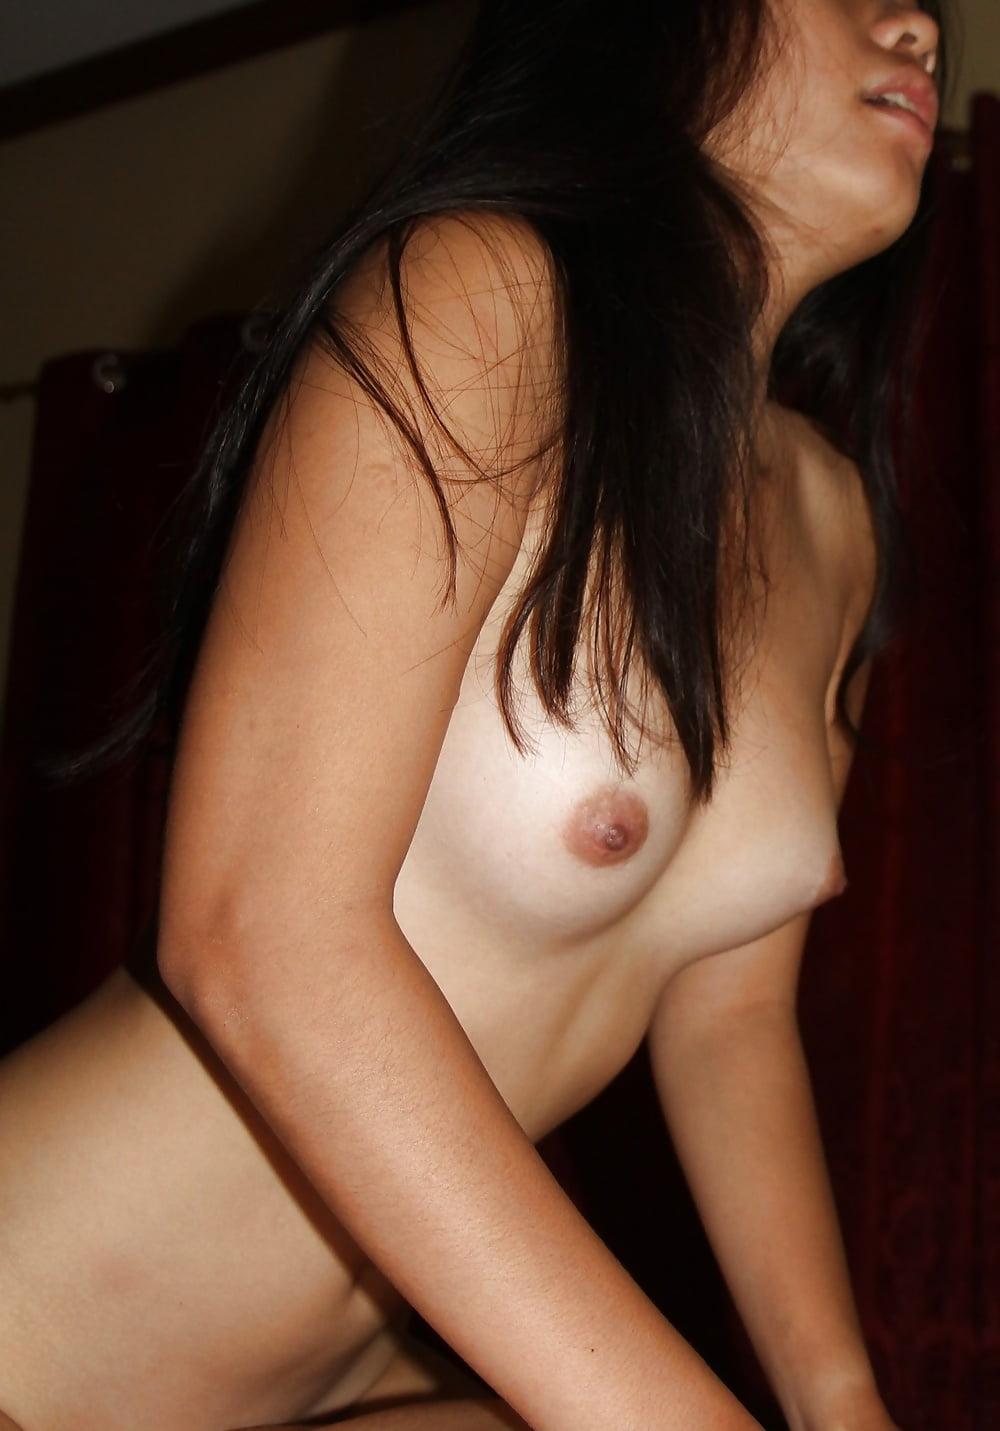 Teen asian shows off thong